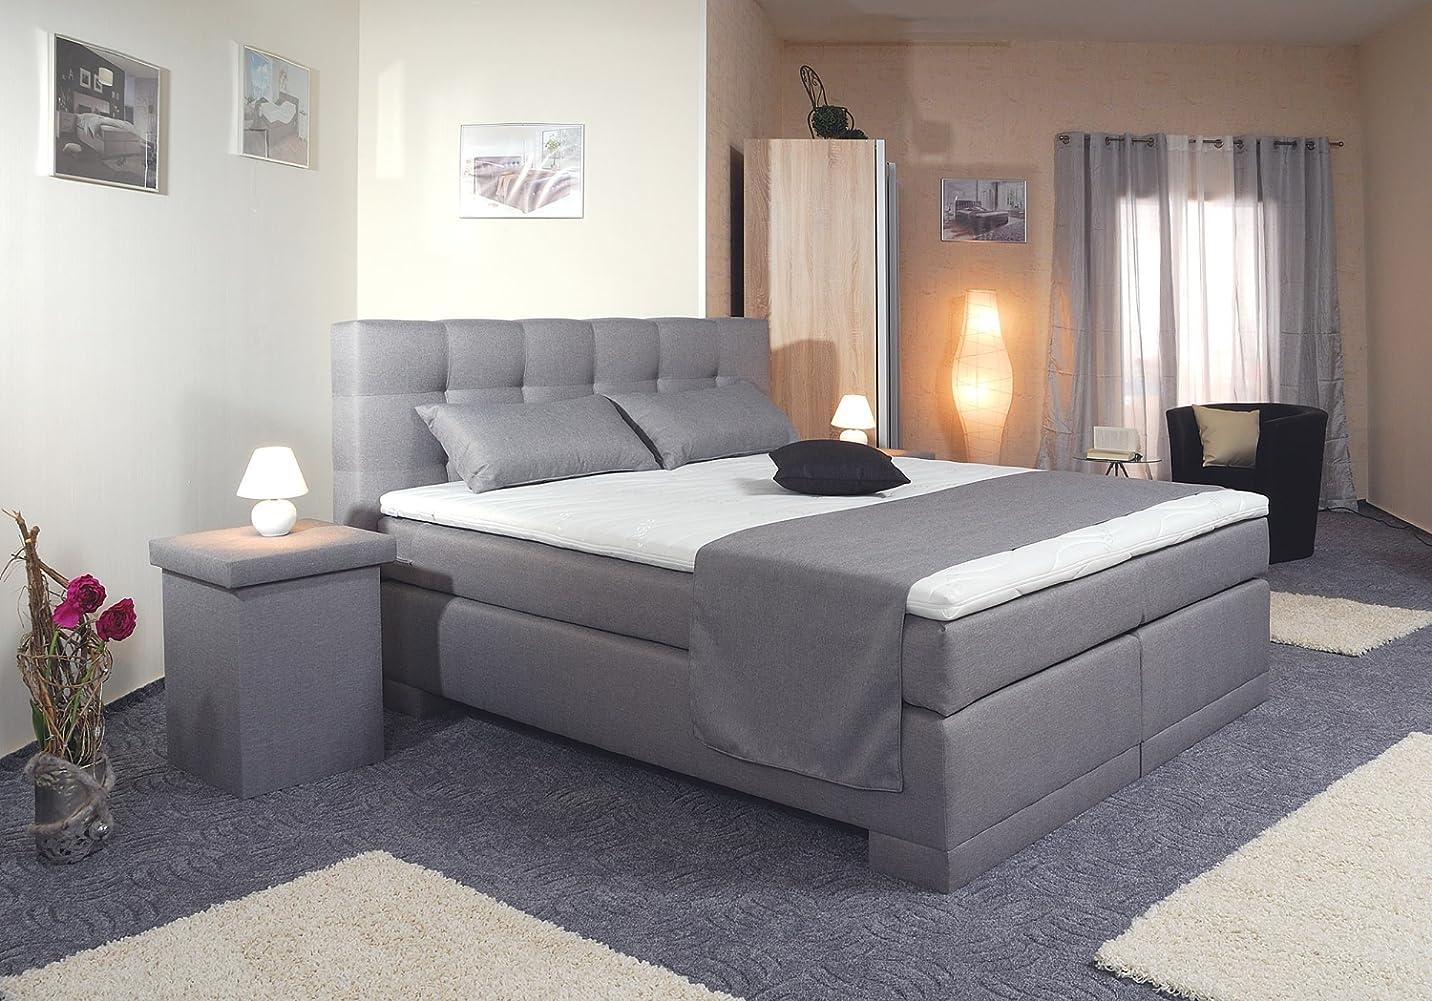 spenger bettenstudio boxspringbett florin 160x200 cm unterfederung bonellfederkern 7 zonen. Black Bedroom Furniture Sets. Home Design Ideas